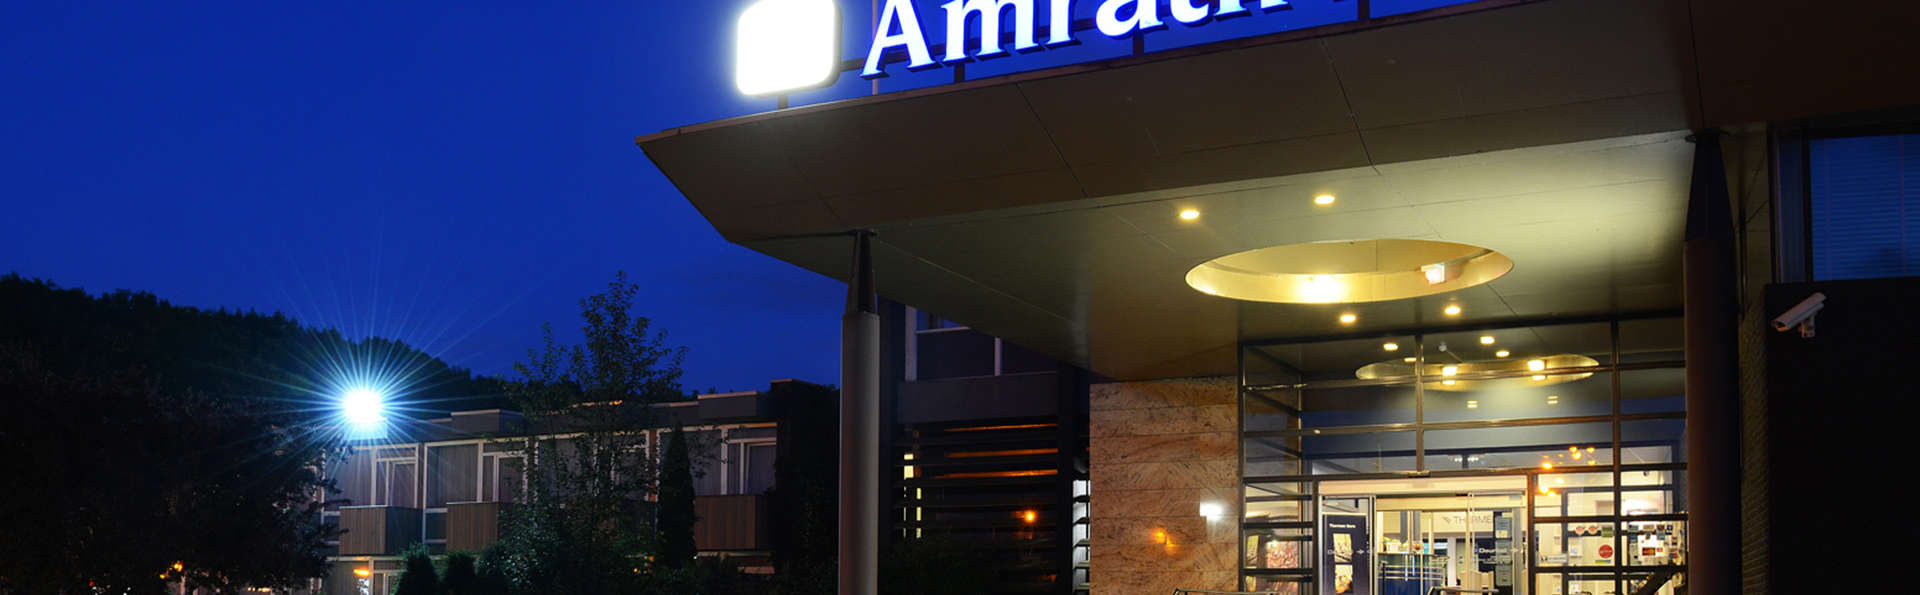 Amrâth Hotel Thermen Born- Sittard - edit_front.jpg